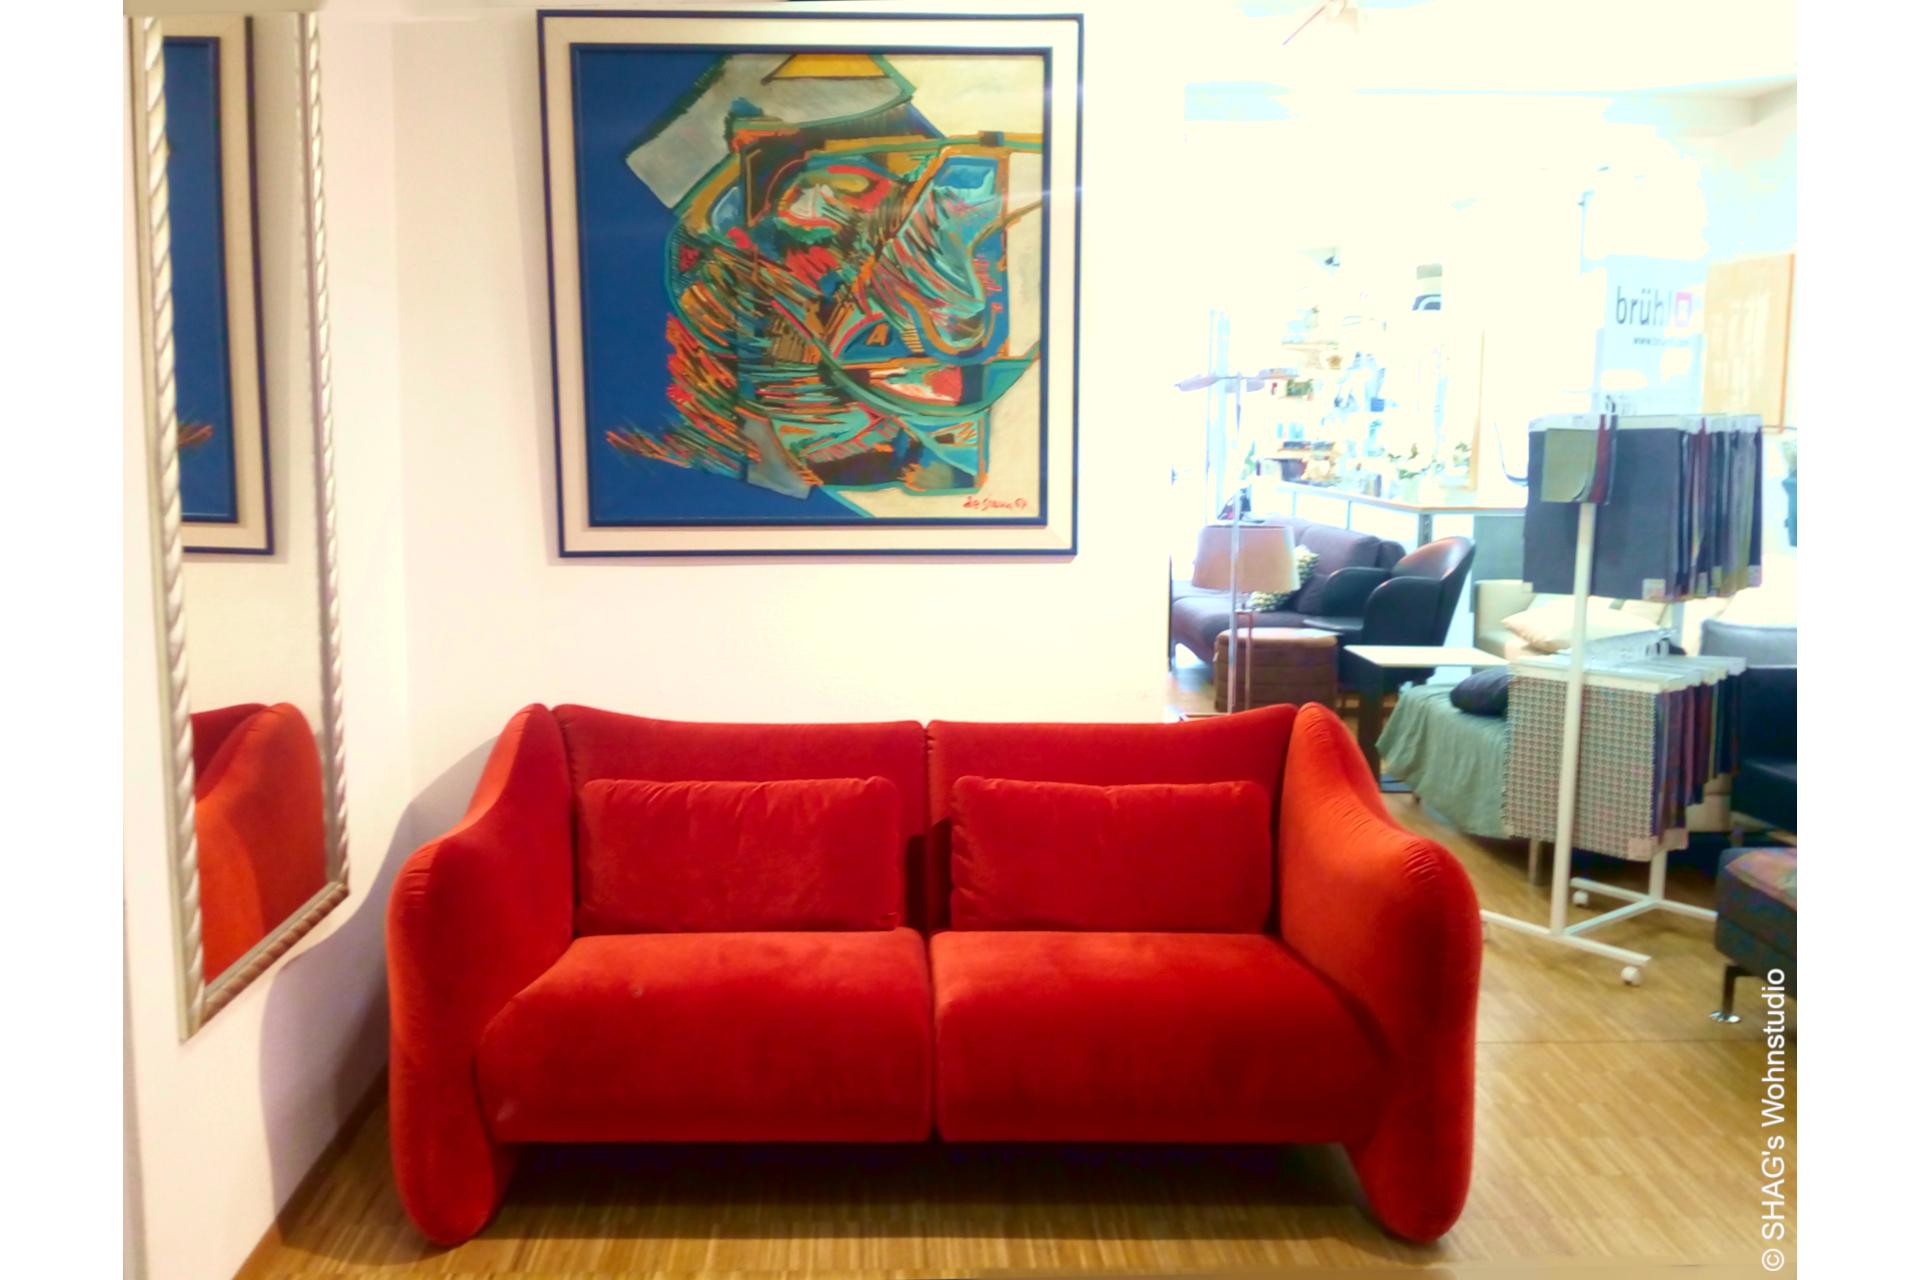 brühl bongo bay Ausstellungs-Sofas Funktionssofas Iconic Award Design Home Sitzkomfort